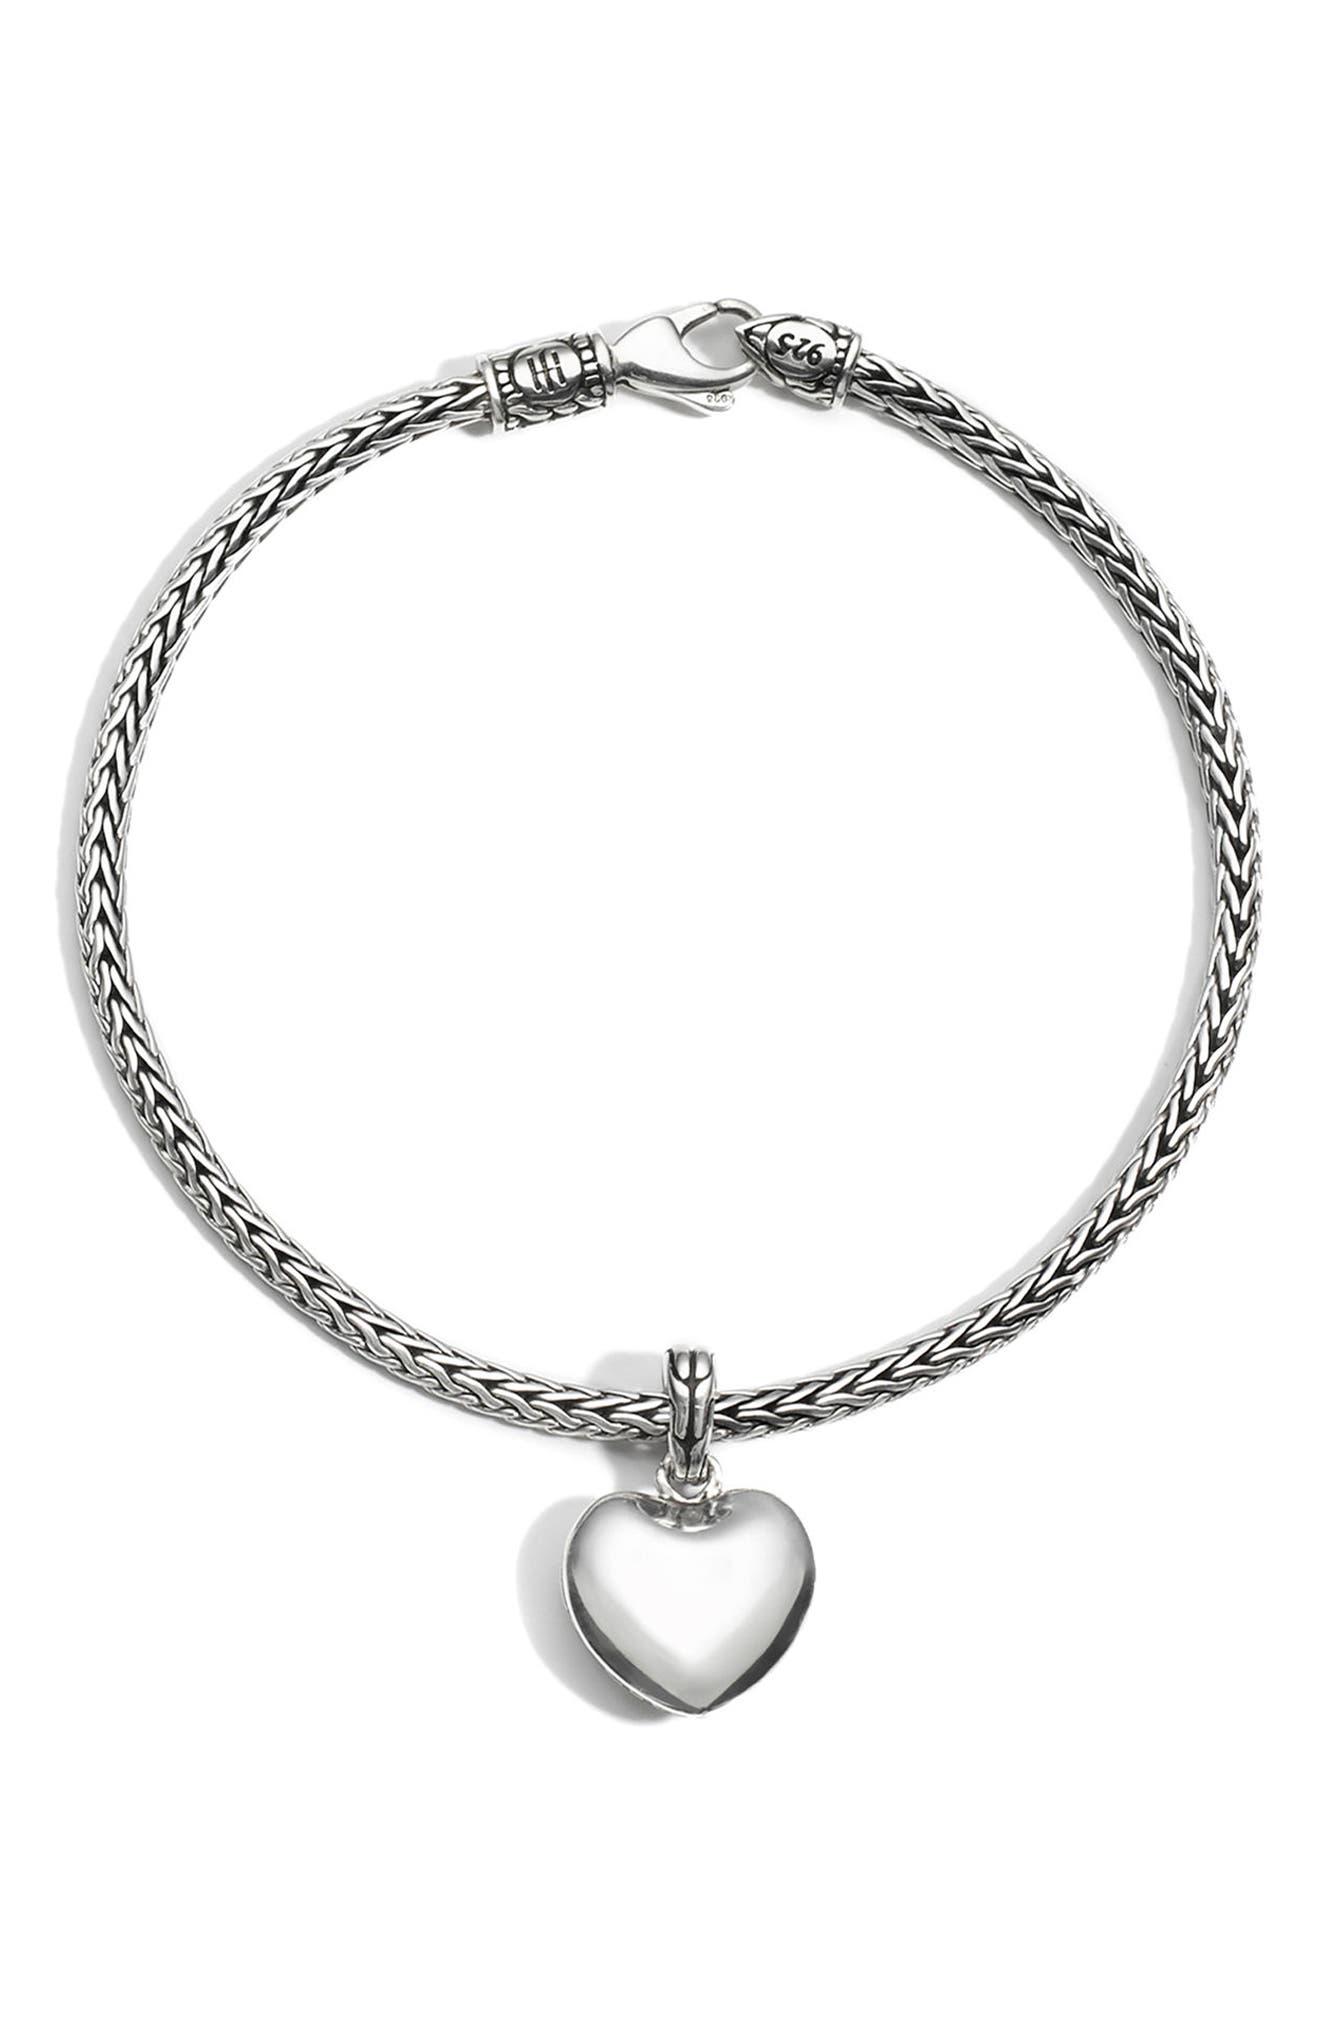 Heart Charm Chain Bracelet,                         Main,                         color, SILVER